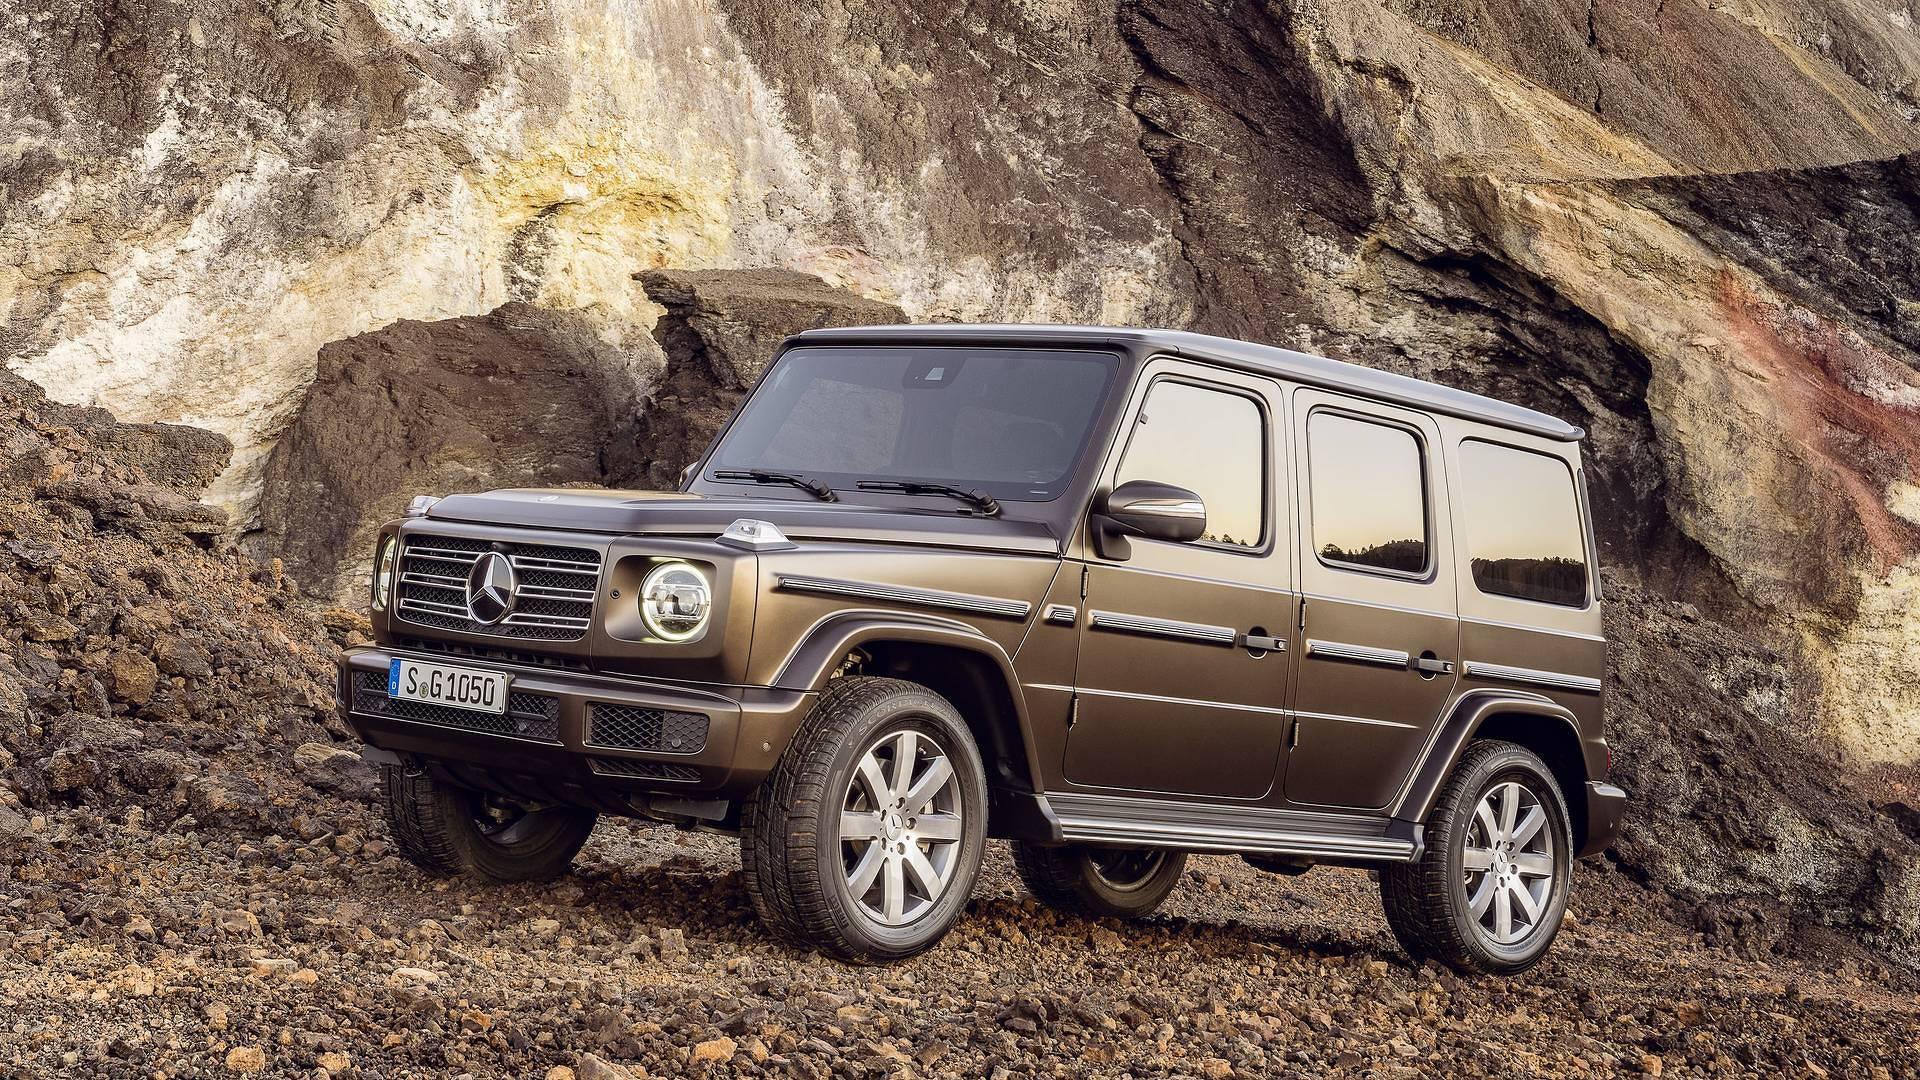 El Mercedes Benz Clase G 2018 Estrenará Una Mecánica Turbodiésel